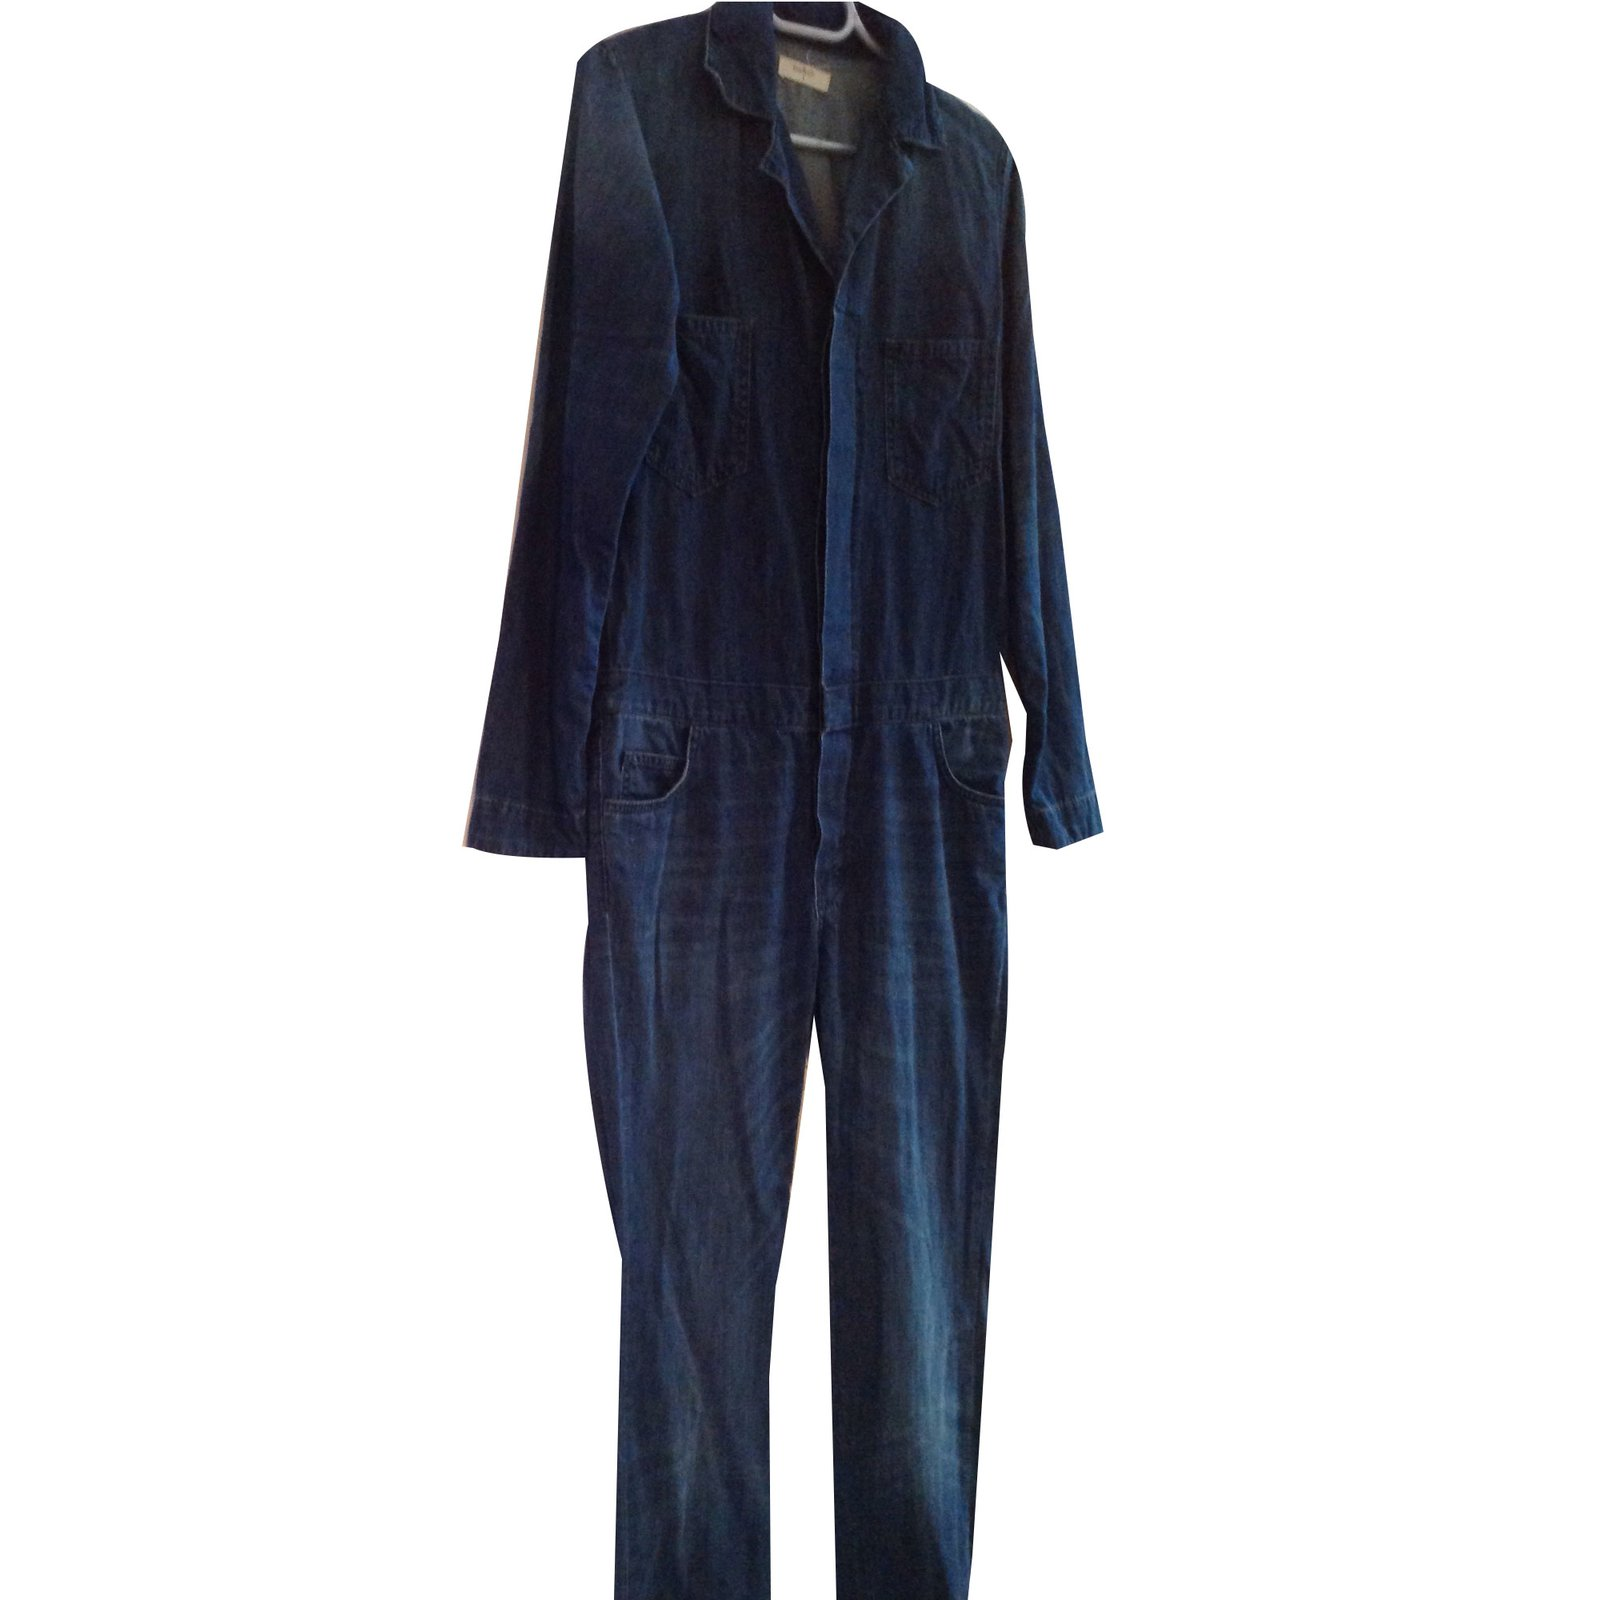 combinaisons ba sh combinaison longue bash en jean jean. Black Bedroom Furniture Sets. Home Design Ideas